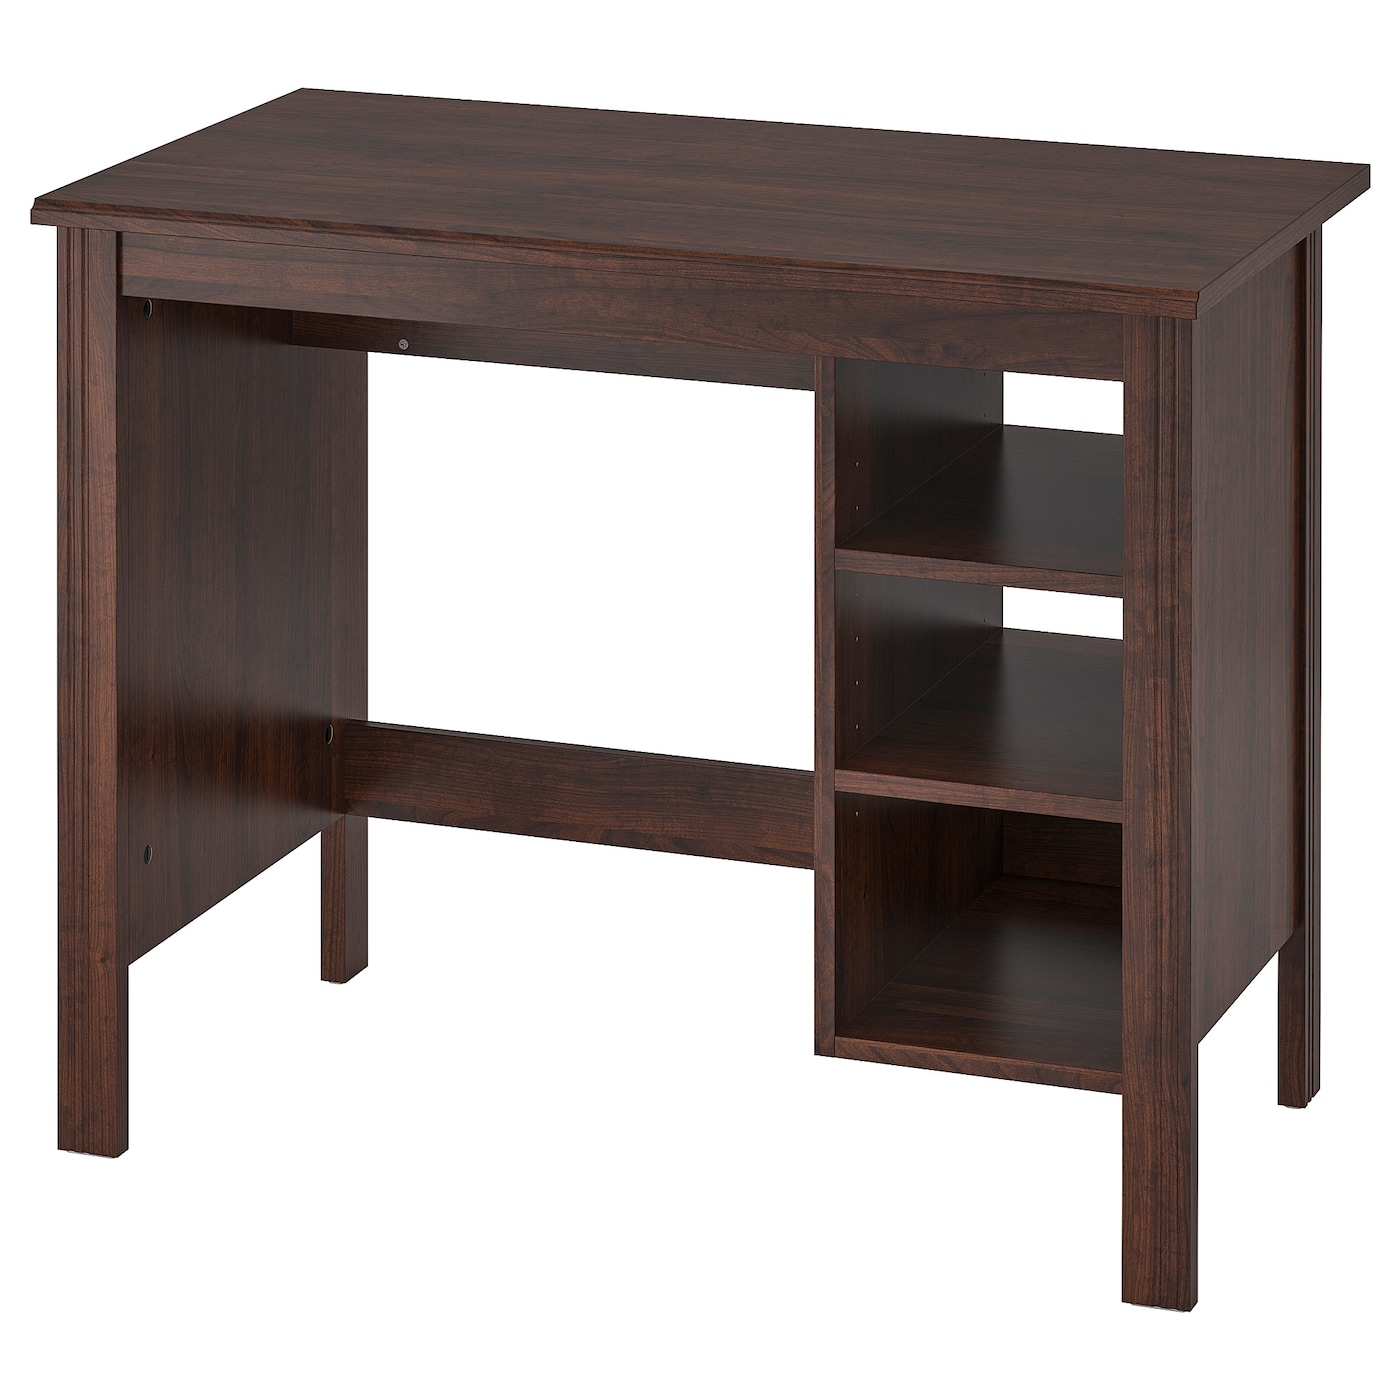 IKEA BRUSALI brązowe biurko, 90x52 cm